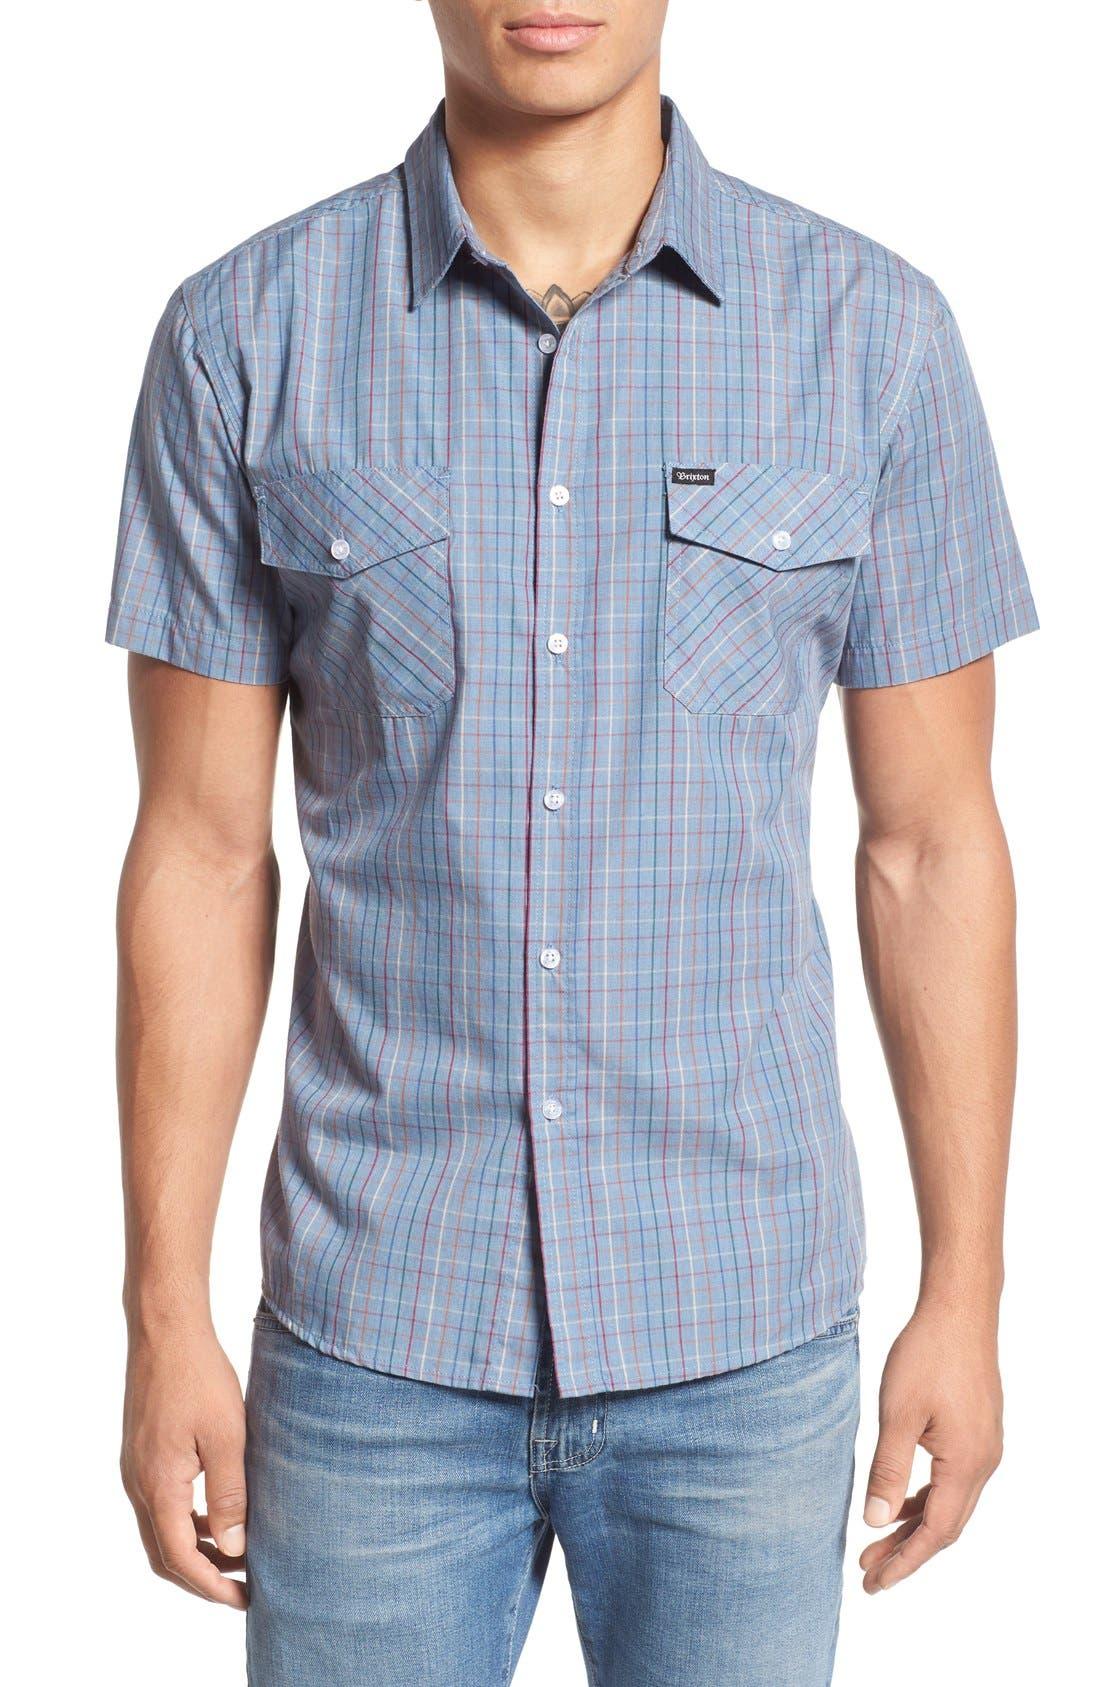 'Memphis' Trim Fit Plaid Short Sleeve Woven Shirt,                             Main thumbnail 1, color,                             Washed Blue